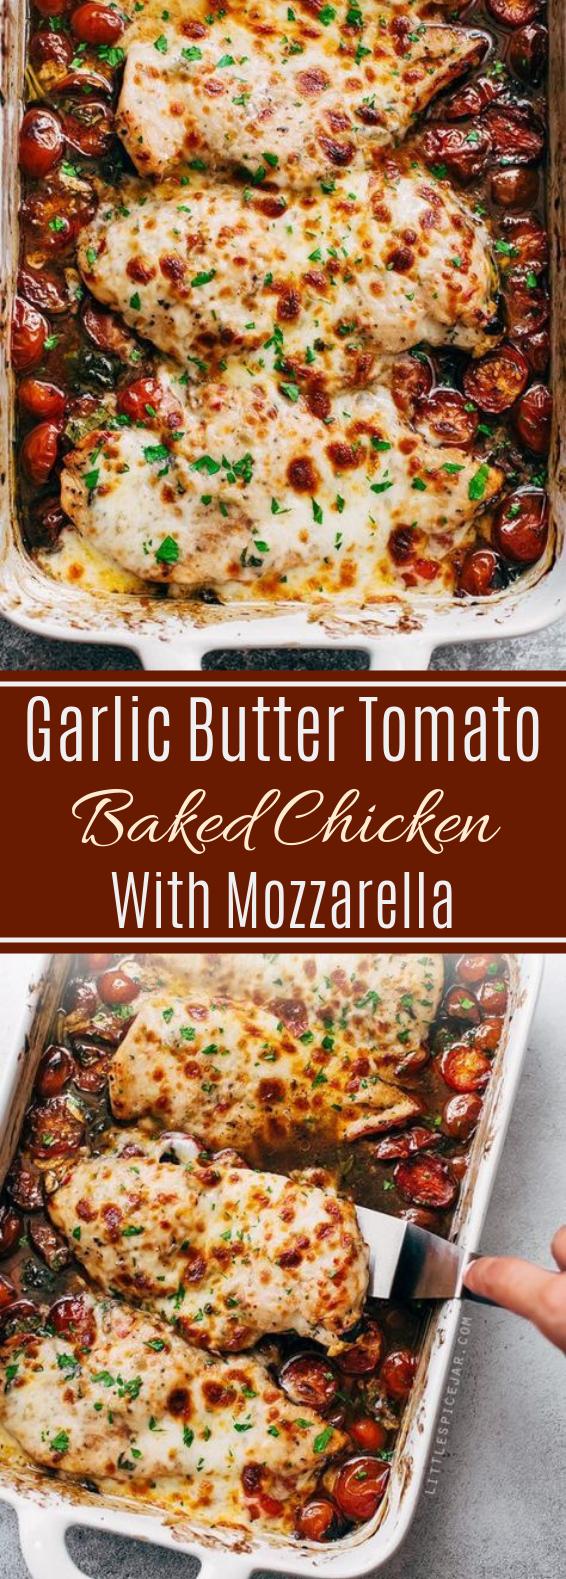 Garlic Butter Tomato Baked Chicken With Mozzarella #dinner #maindish